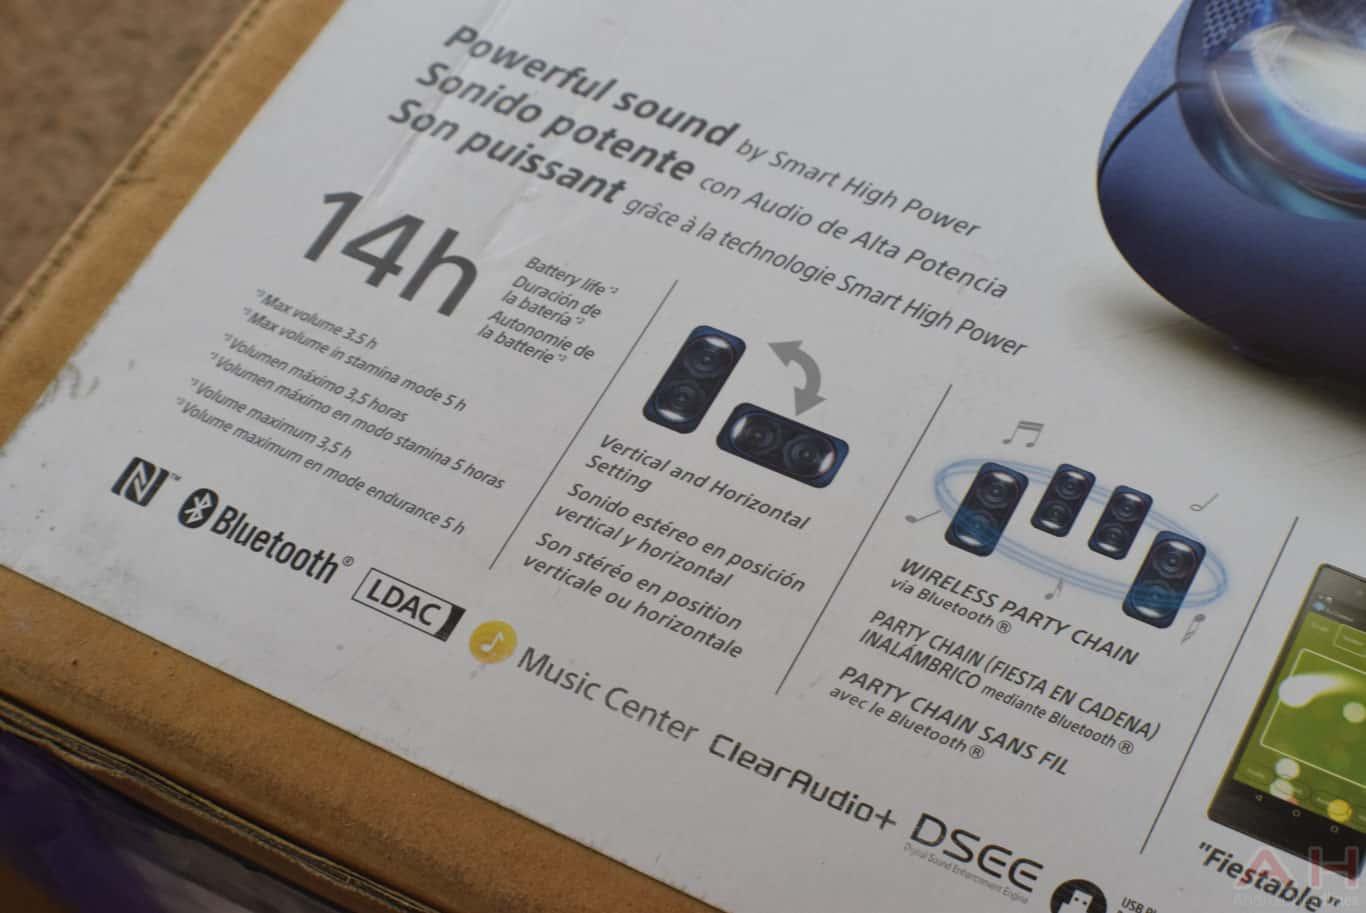 Sony GTK-XB60 EXTRA BASS Bluetooth Speaker Review: Big, Beautiful Sound